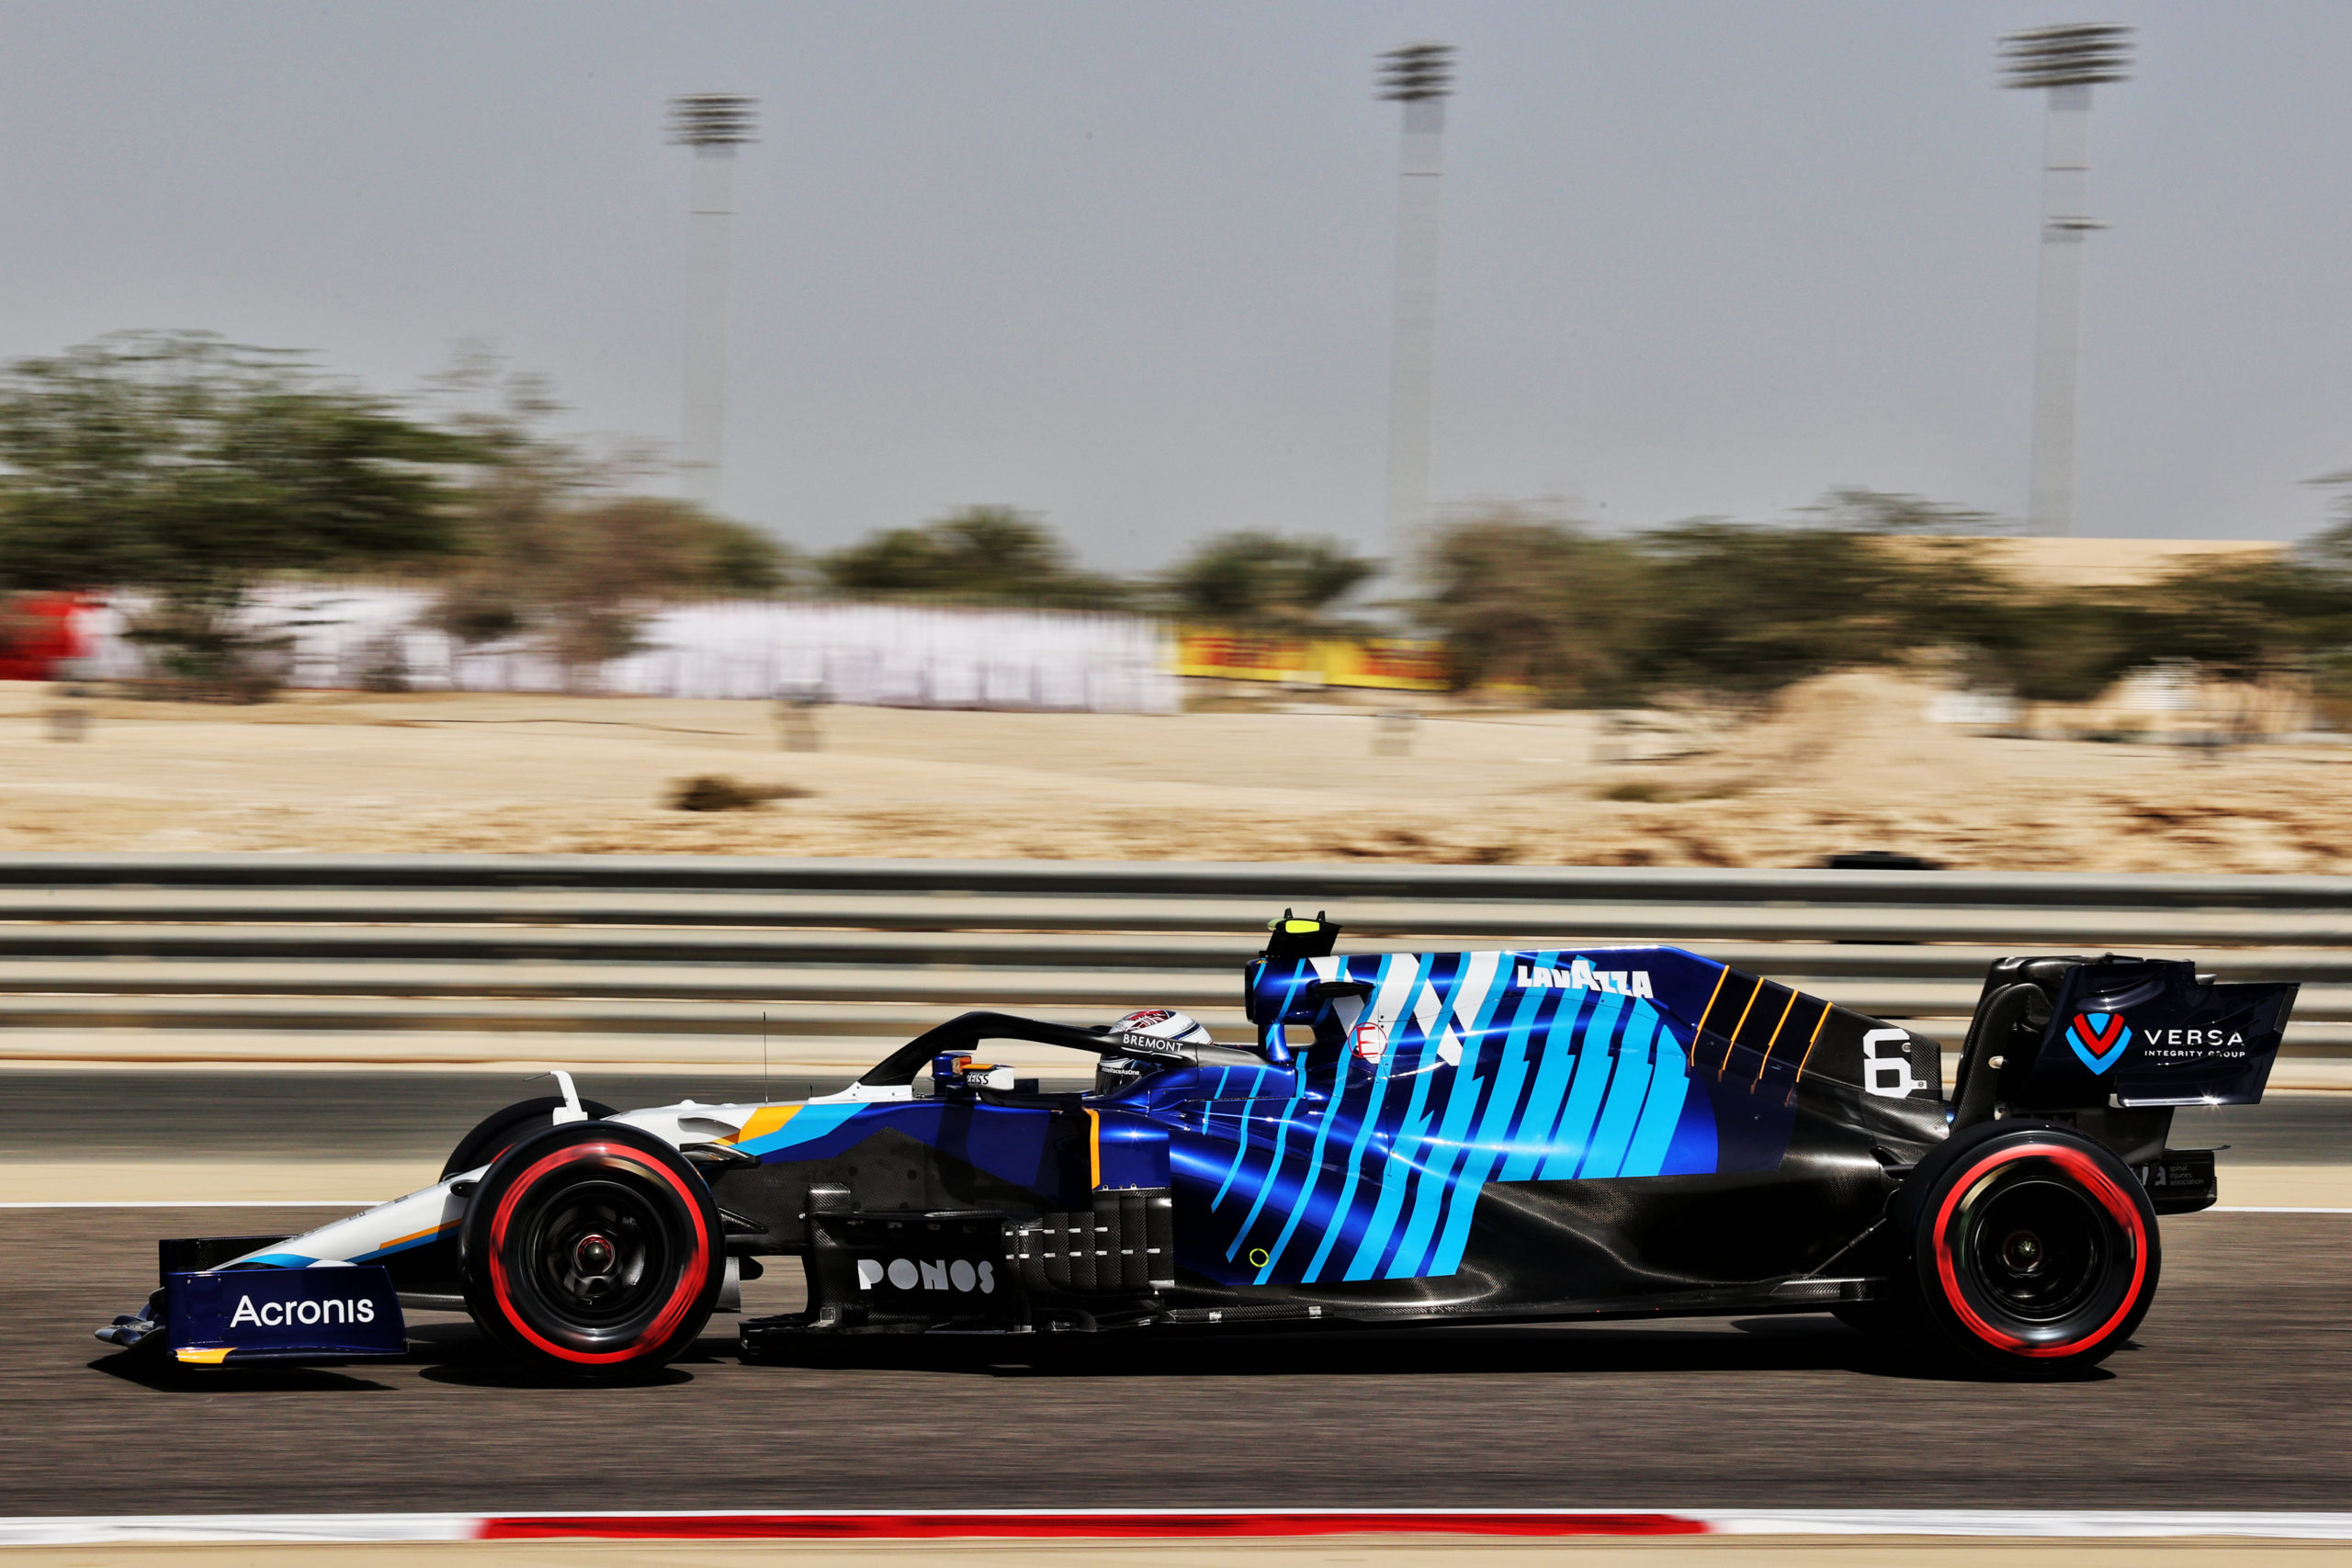 Nicholas Latifi (CDN) Williams Racing FW43B. Bahrain Grand Prix, Friday 26th March 2021. Sakhir, Bahrain.